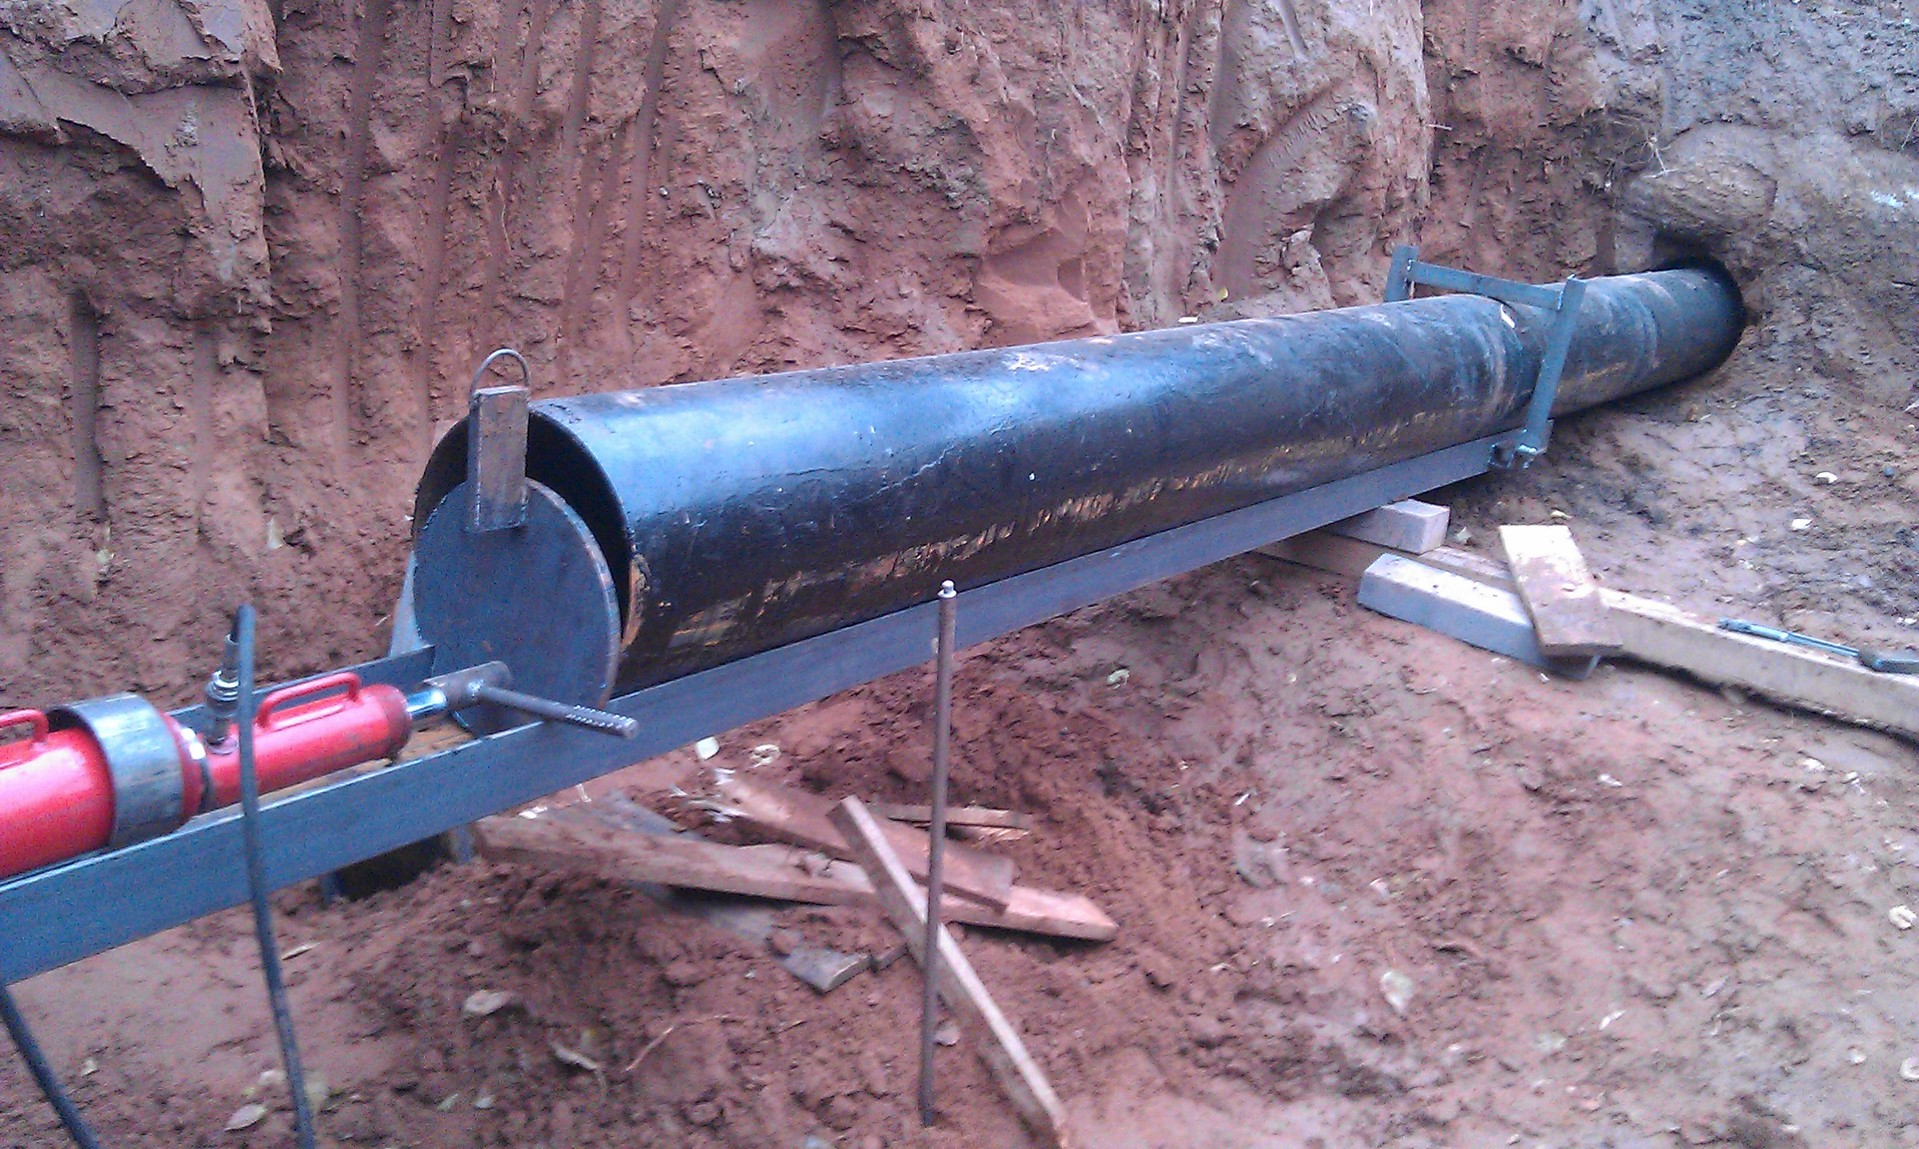 Бестраншейная прокладка труб: метод, установки (оборудование) | бестраншейная прокладка трубопроводов: способ, технология